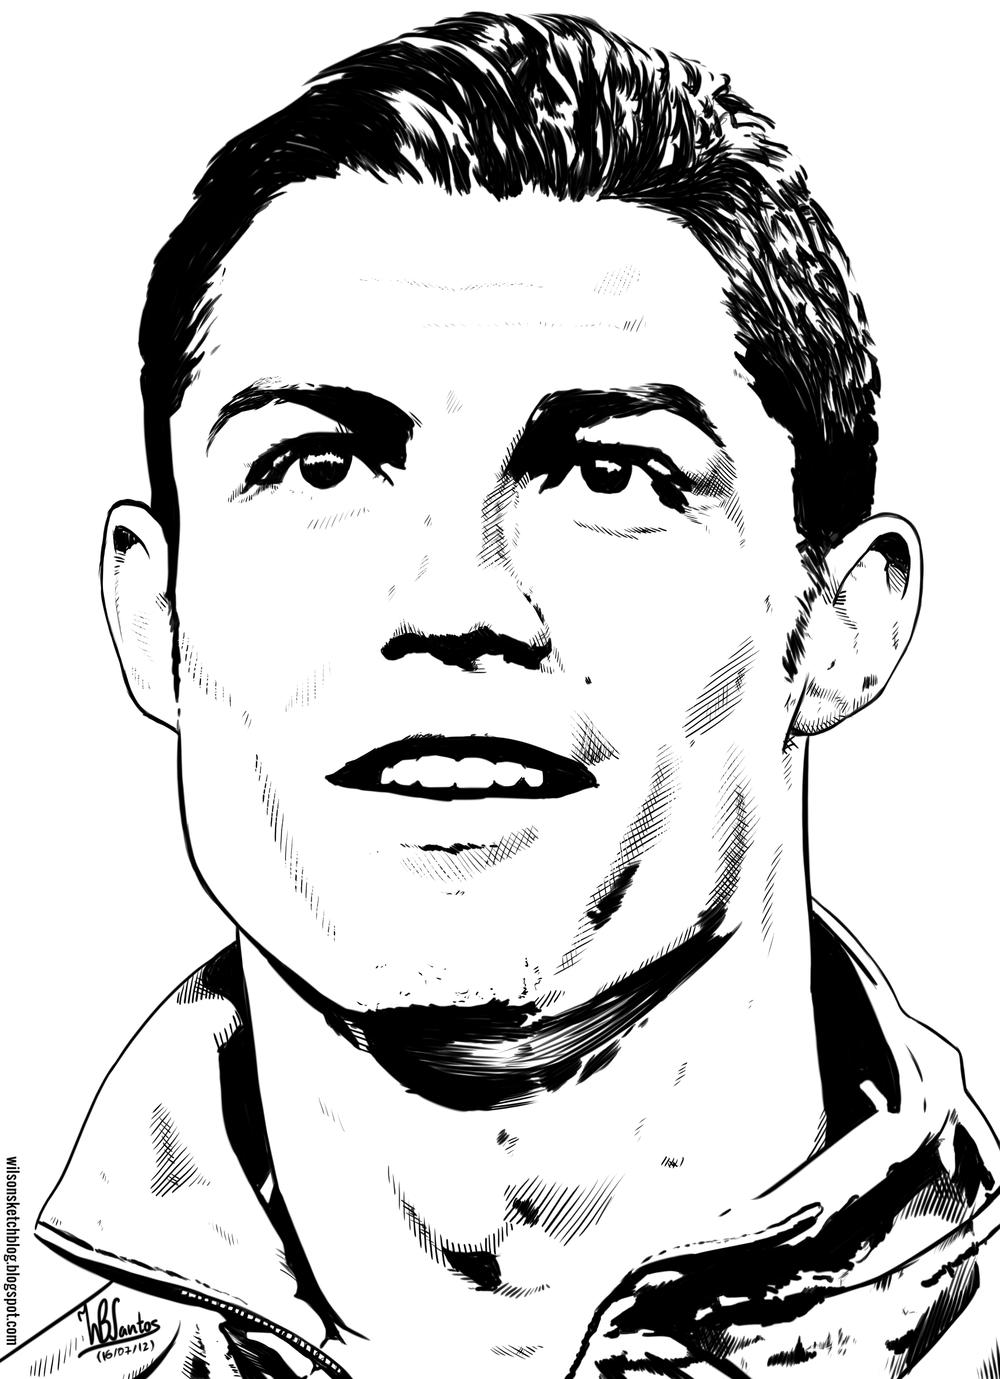 Cristiano Ronaldo face line art drawing in 2019.